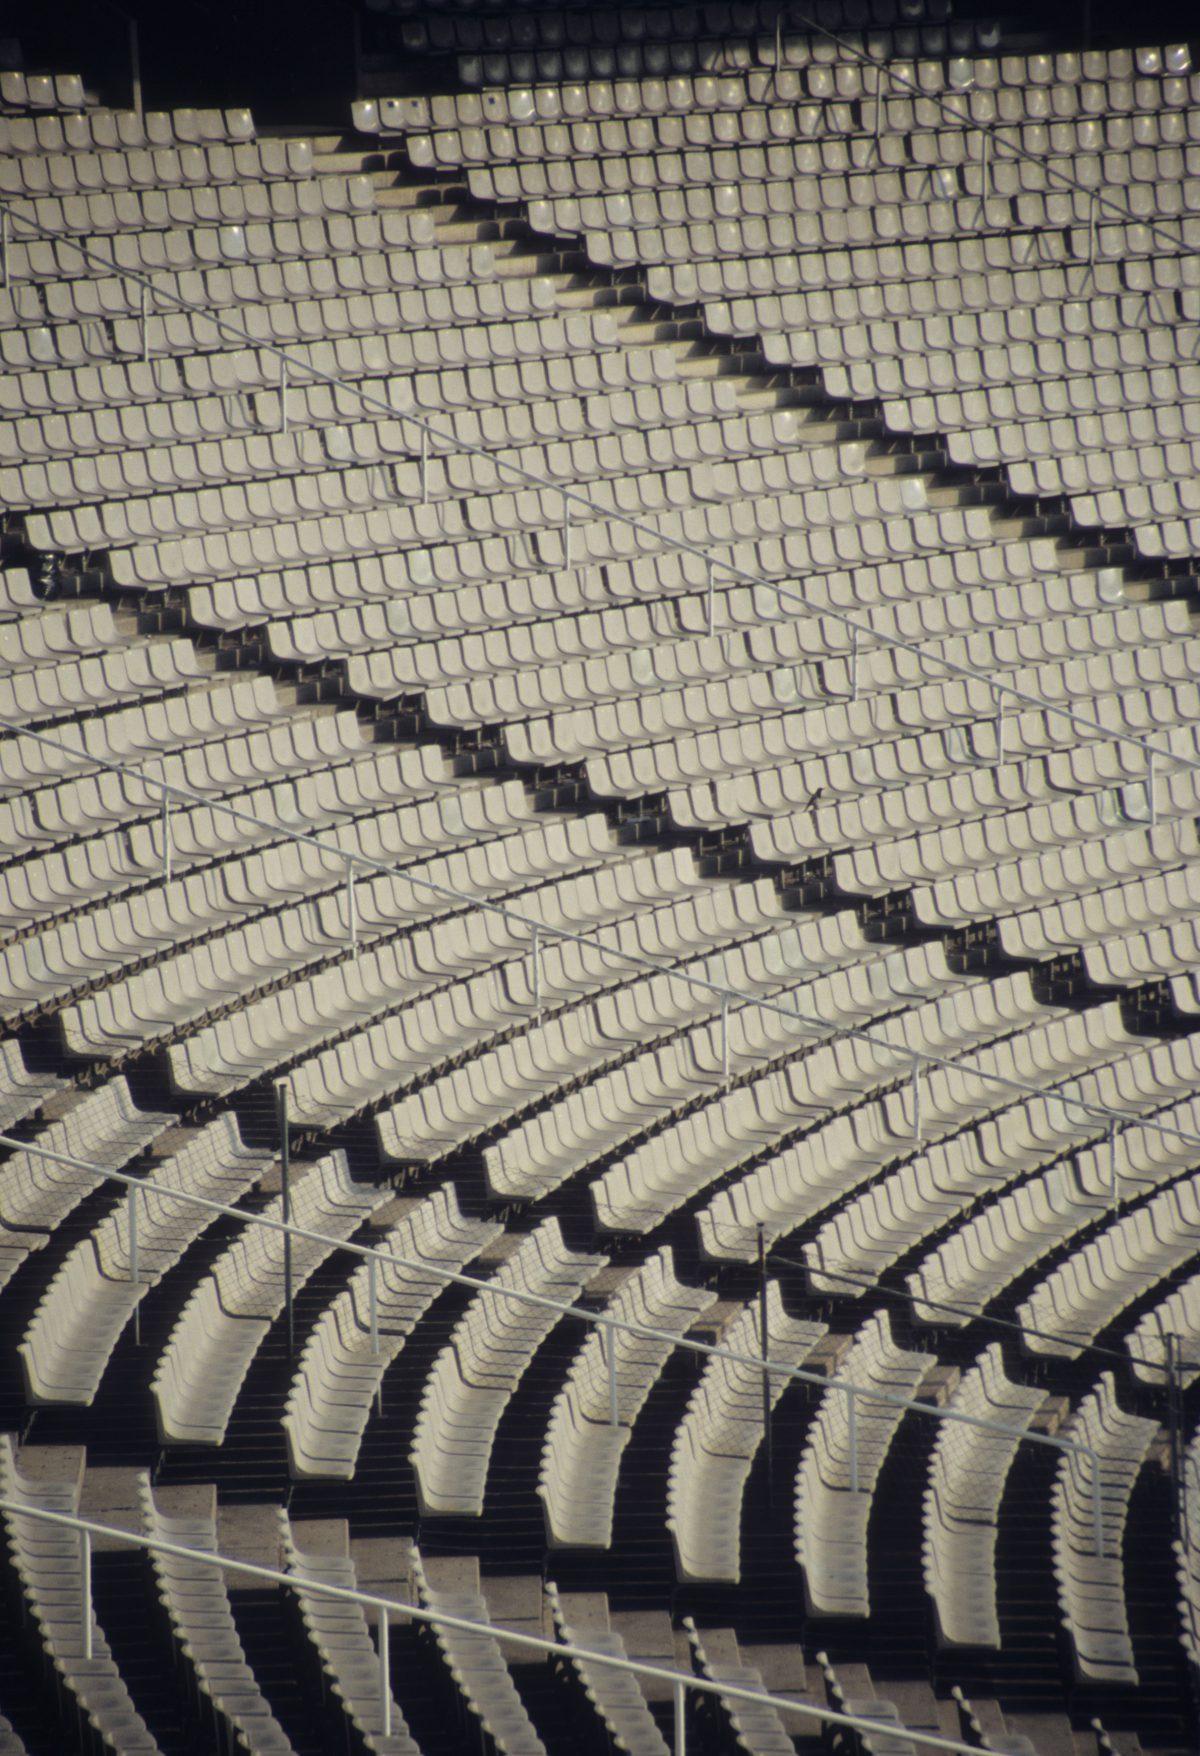 Olypmic park, stadium